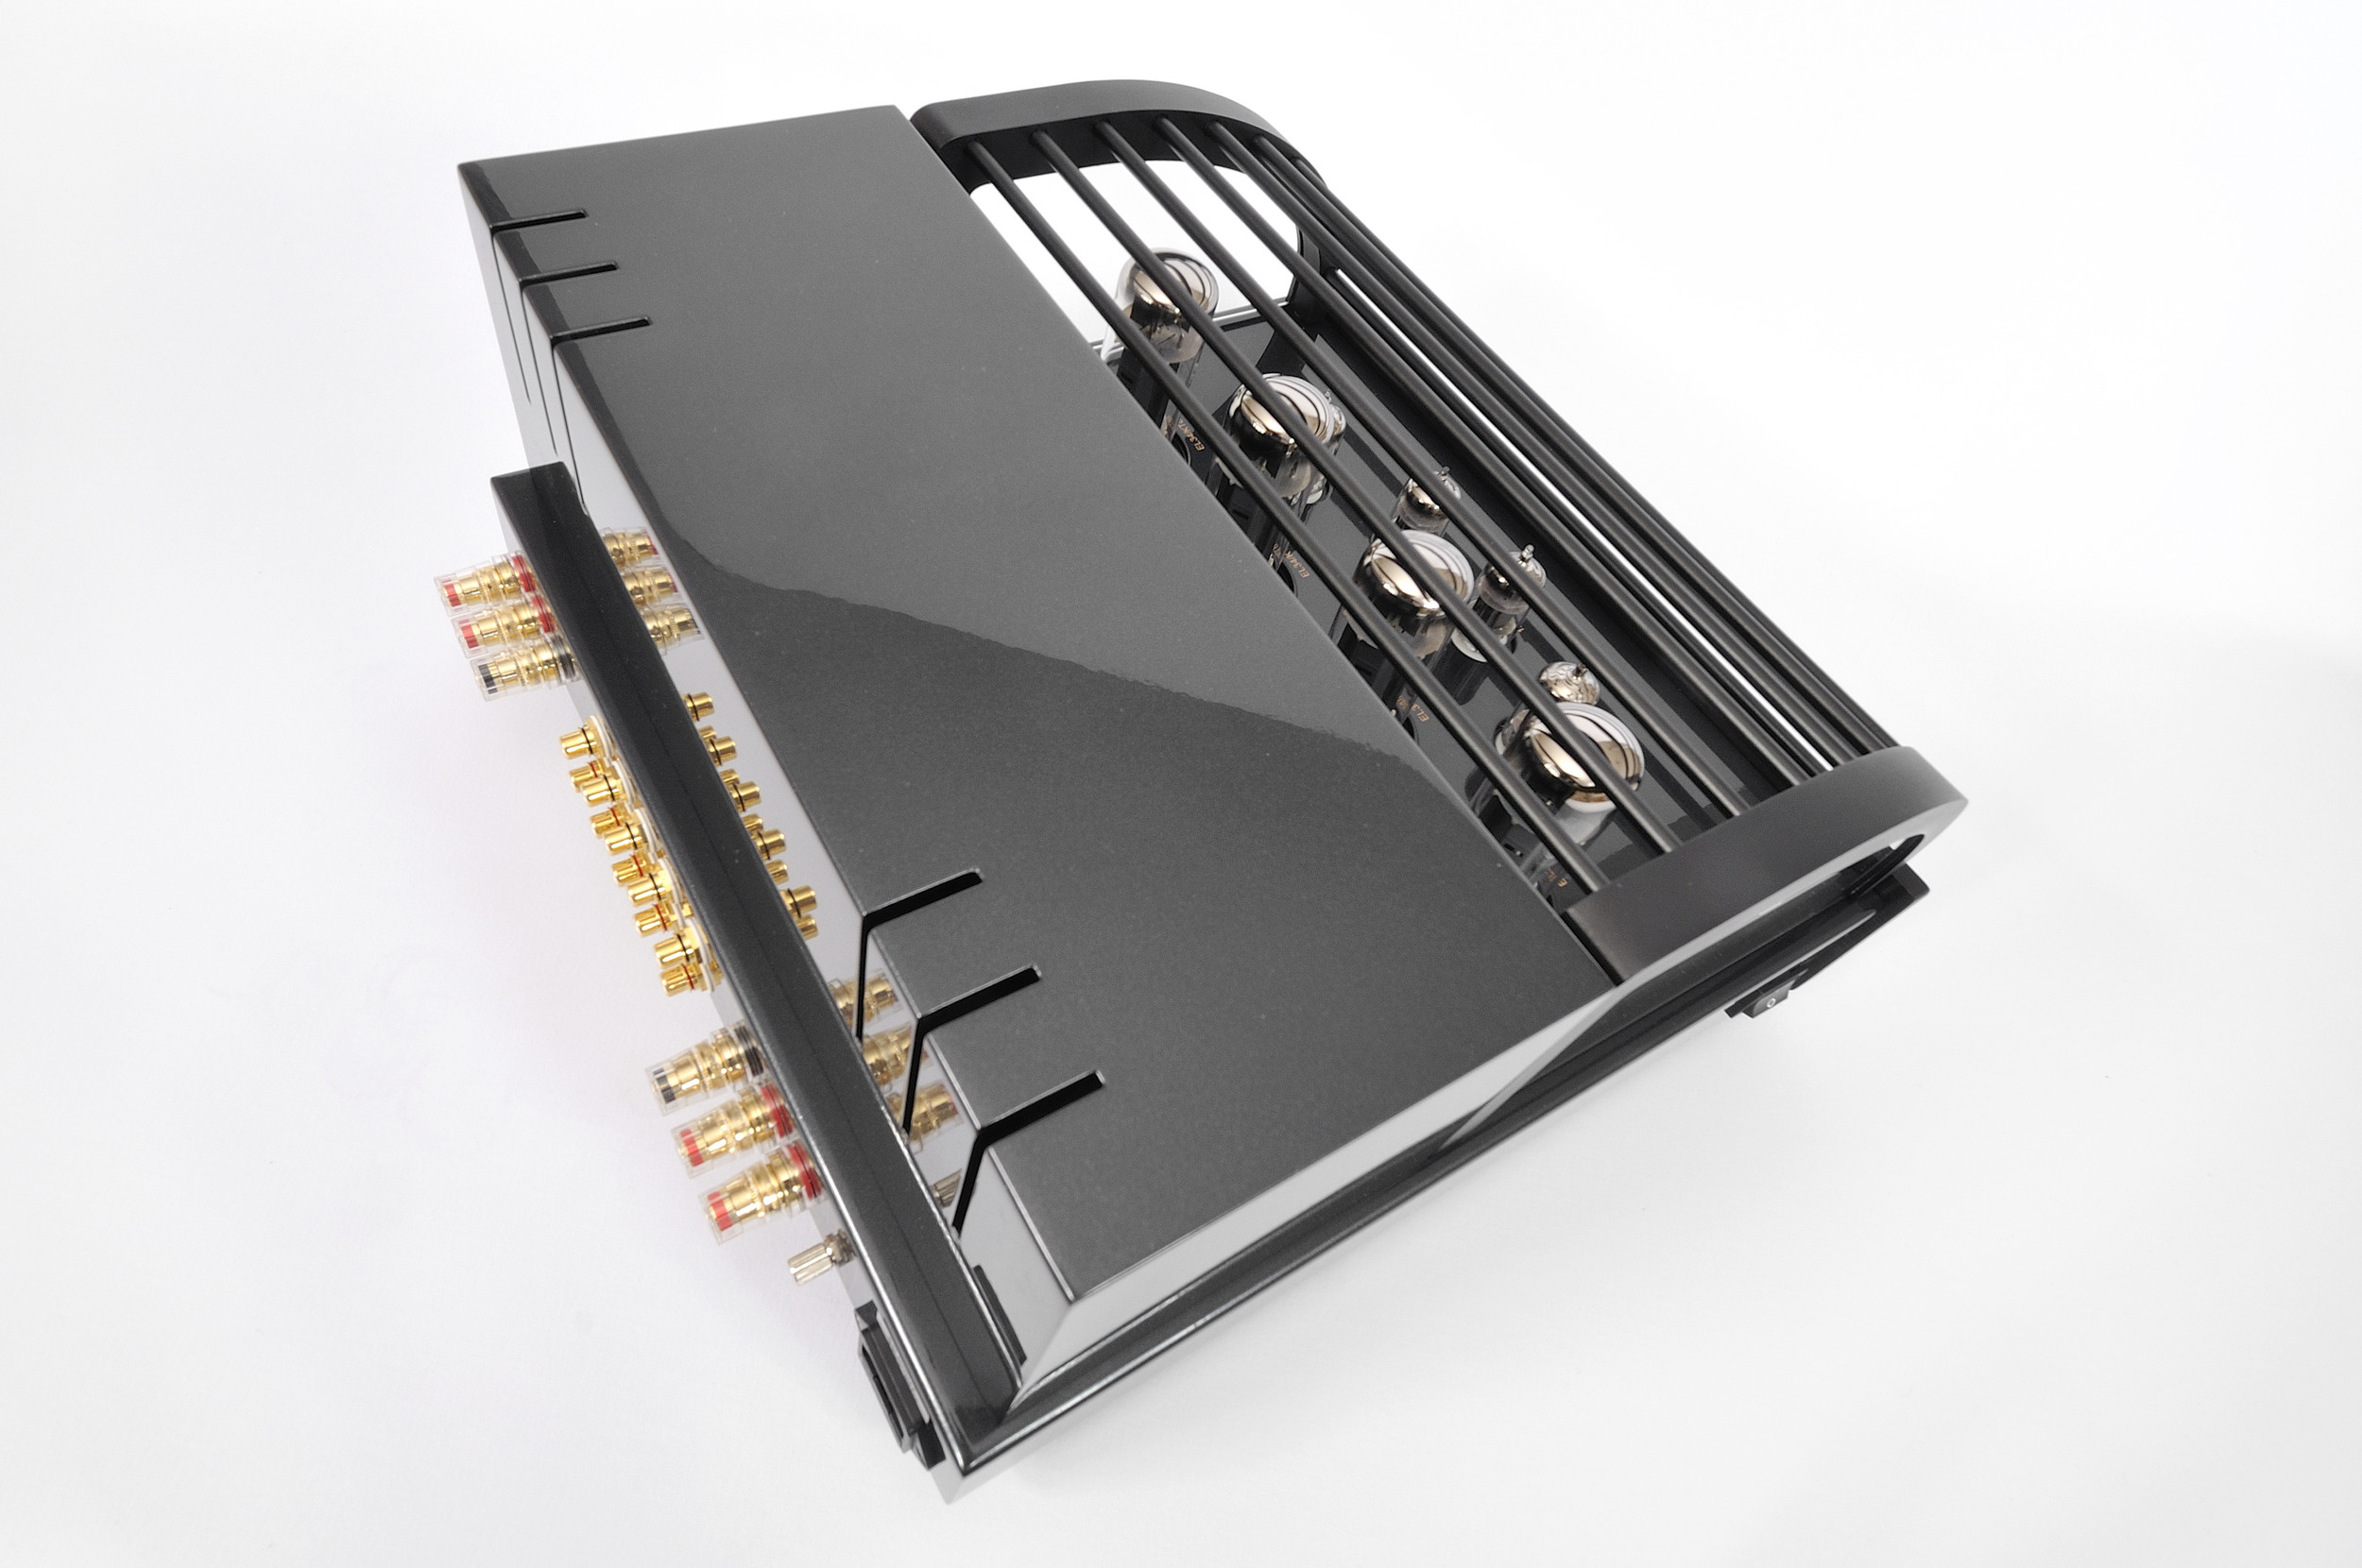 ProLogue Premium Integrated Amplifier - black - special shot - HR - JPG.jpg